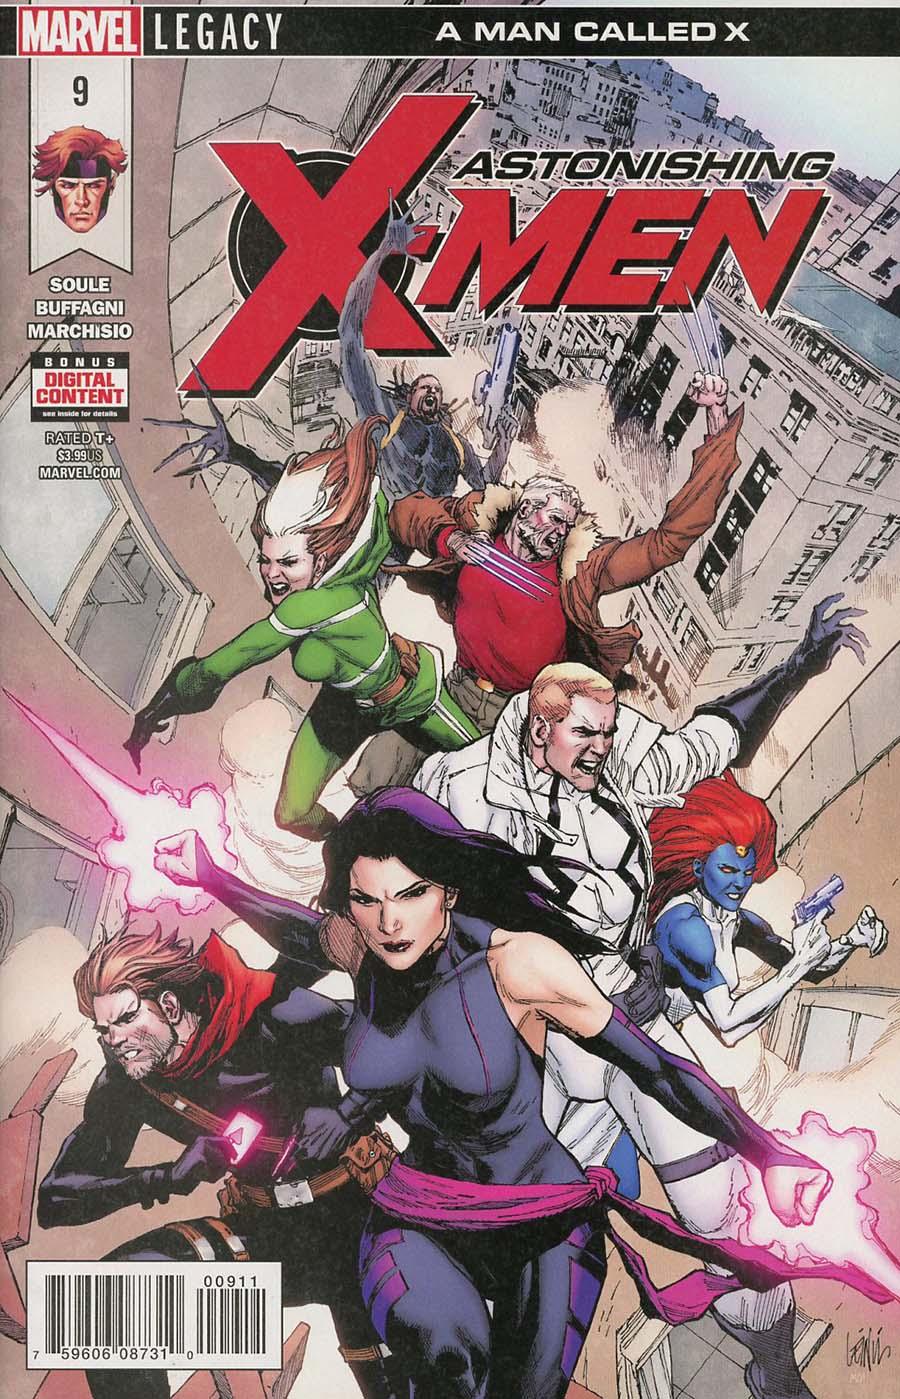 Astonishing X-Men Vol 4 #9 (Marvel Legacy Tie-In)